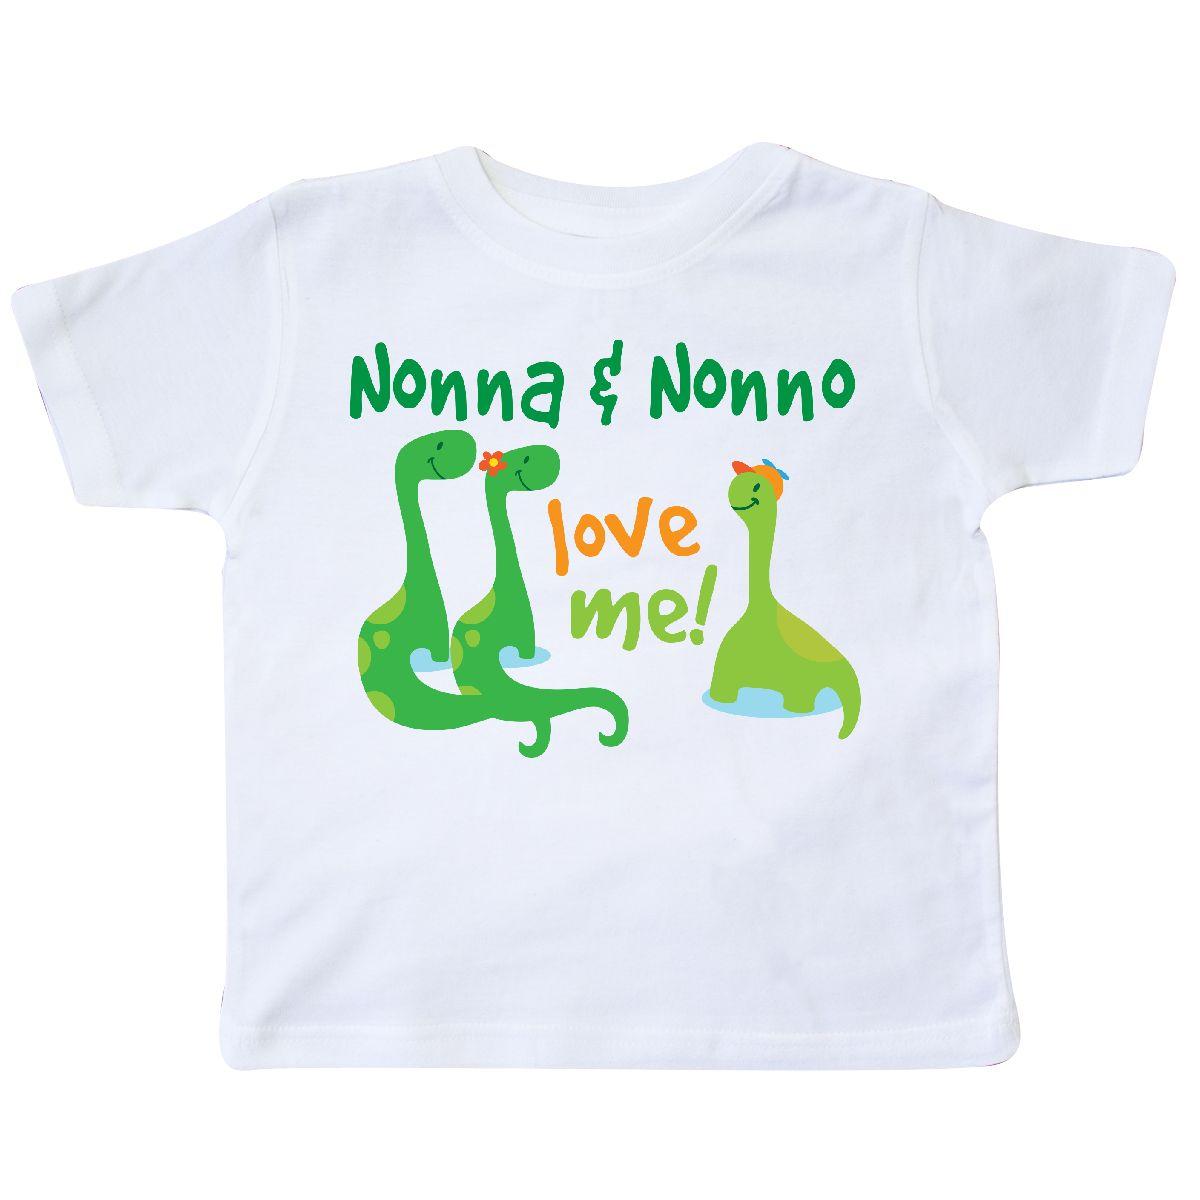 Toddler//Kids Short Sleeve T-Shirt My Nana in Indiana Loves Me